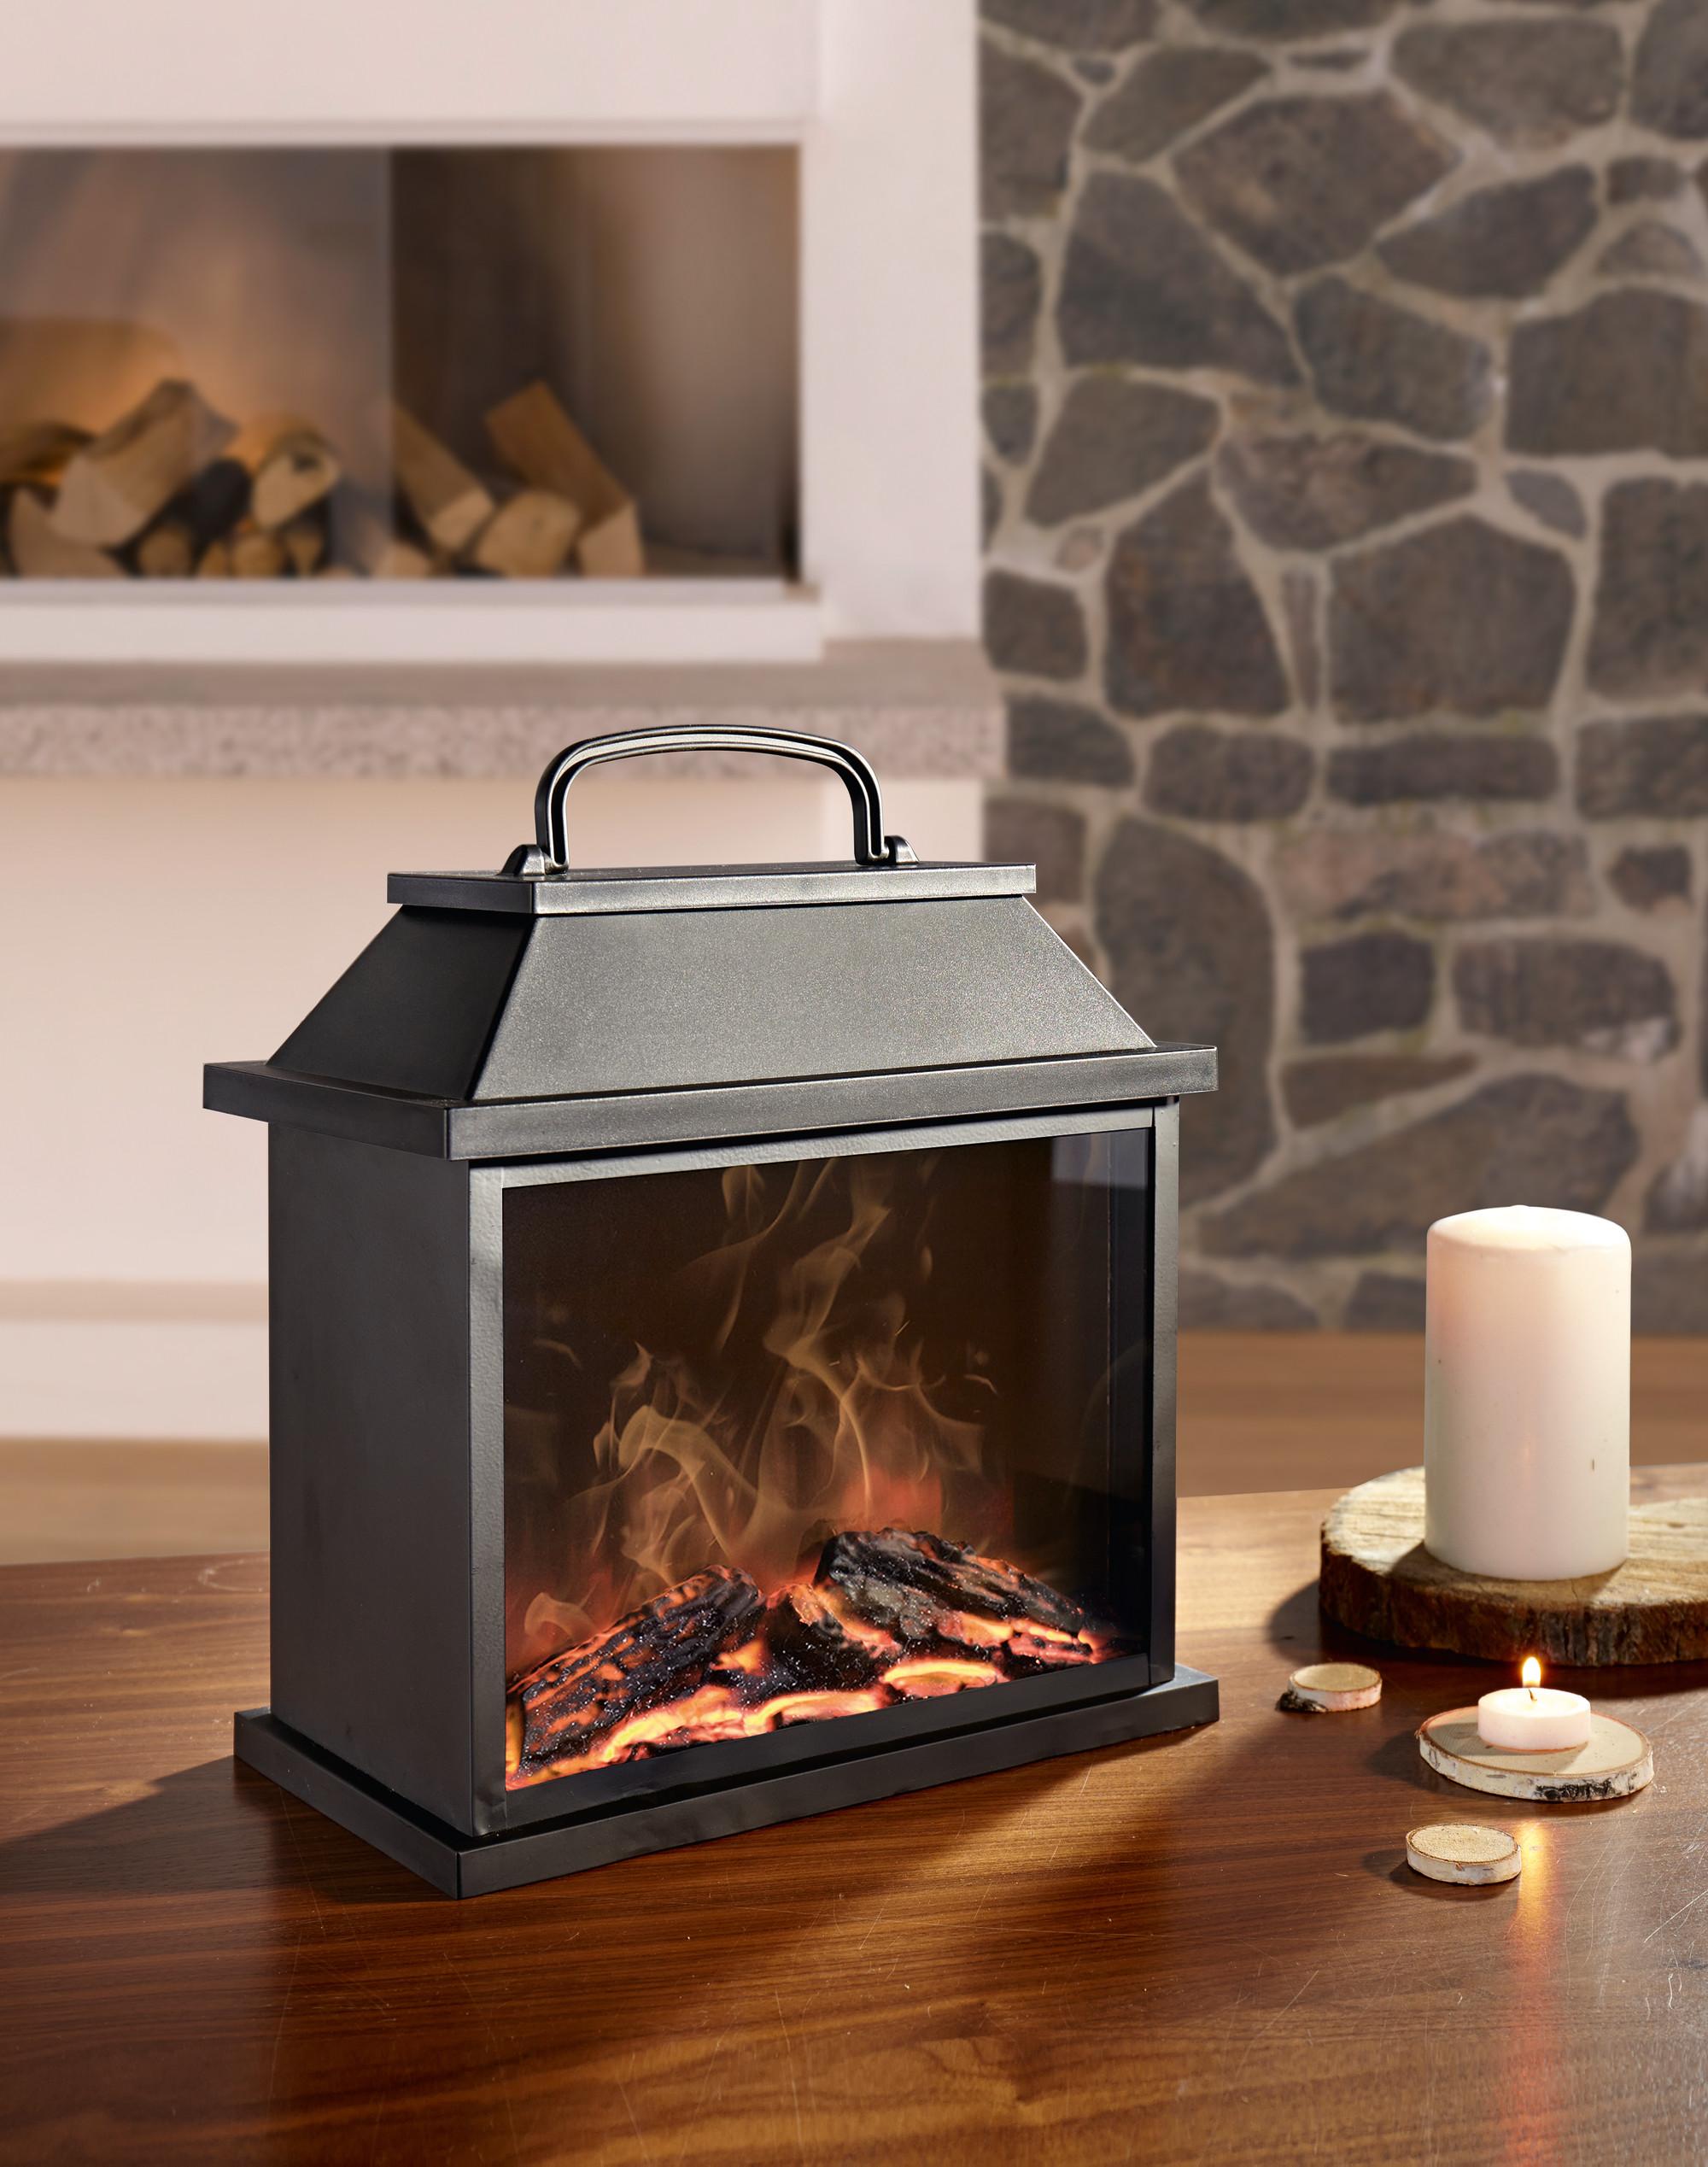 Led Laterne Kamin Stand Elektro Ofen Kamin Warme Feuer Mit Flammeneffekt